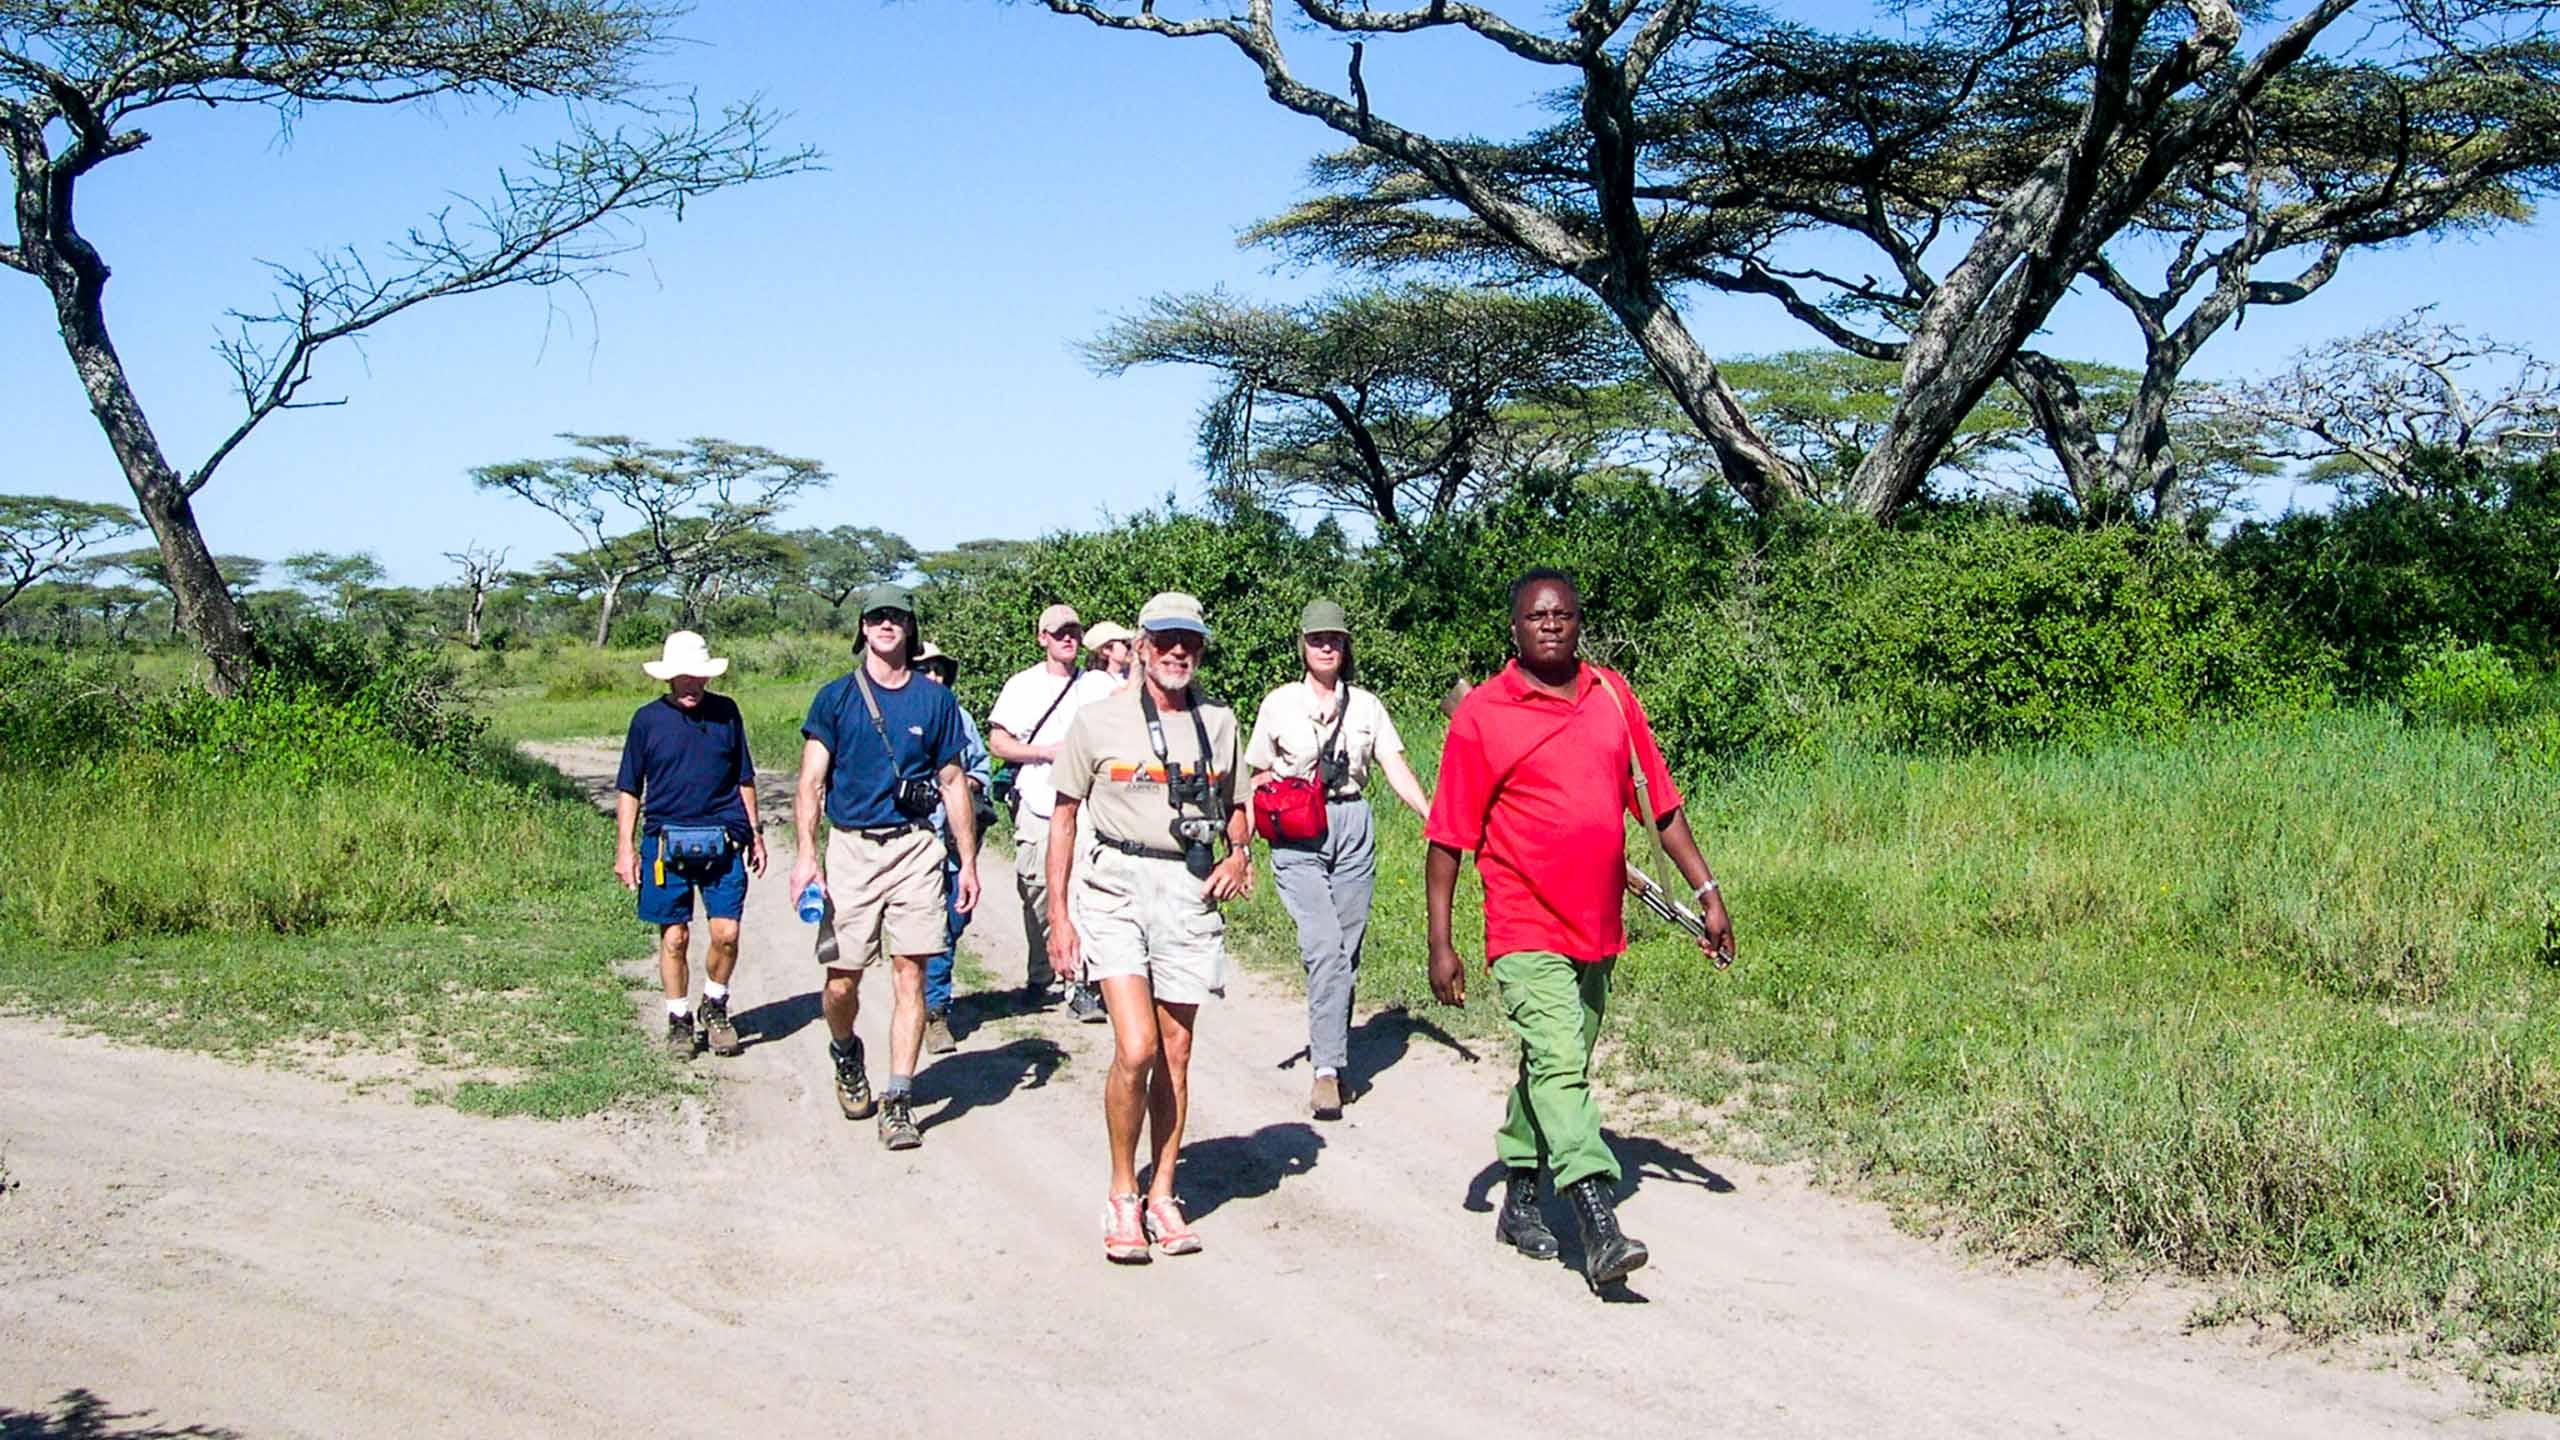 Safari groups walks along Tanzania road